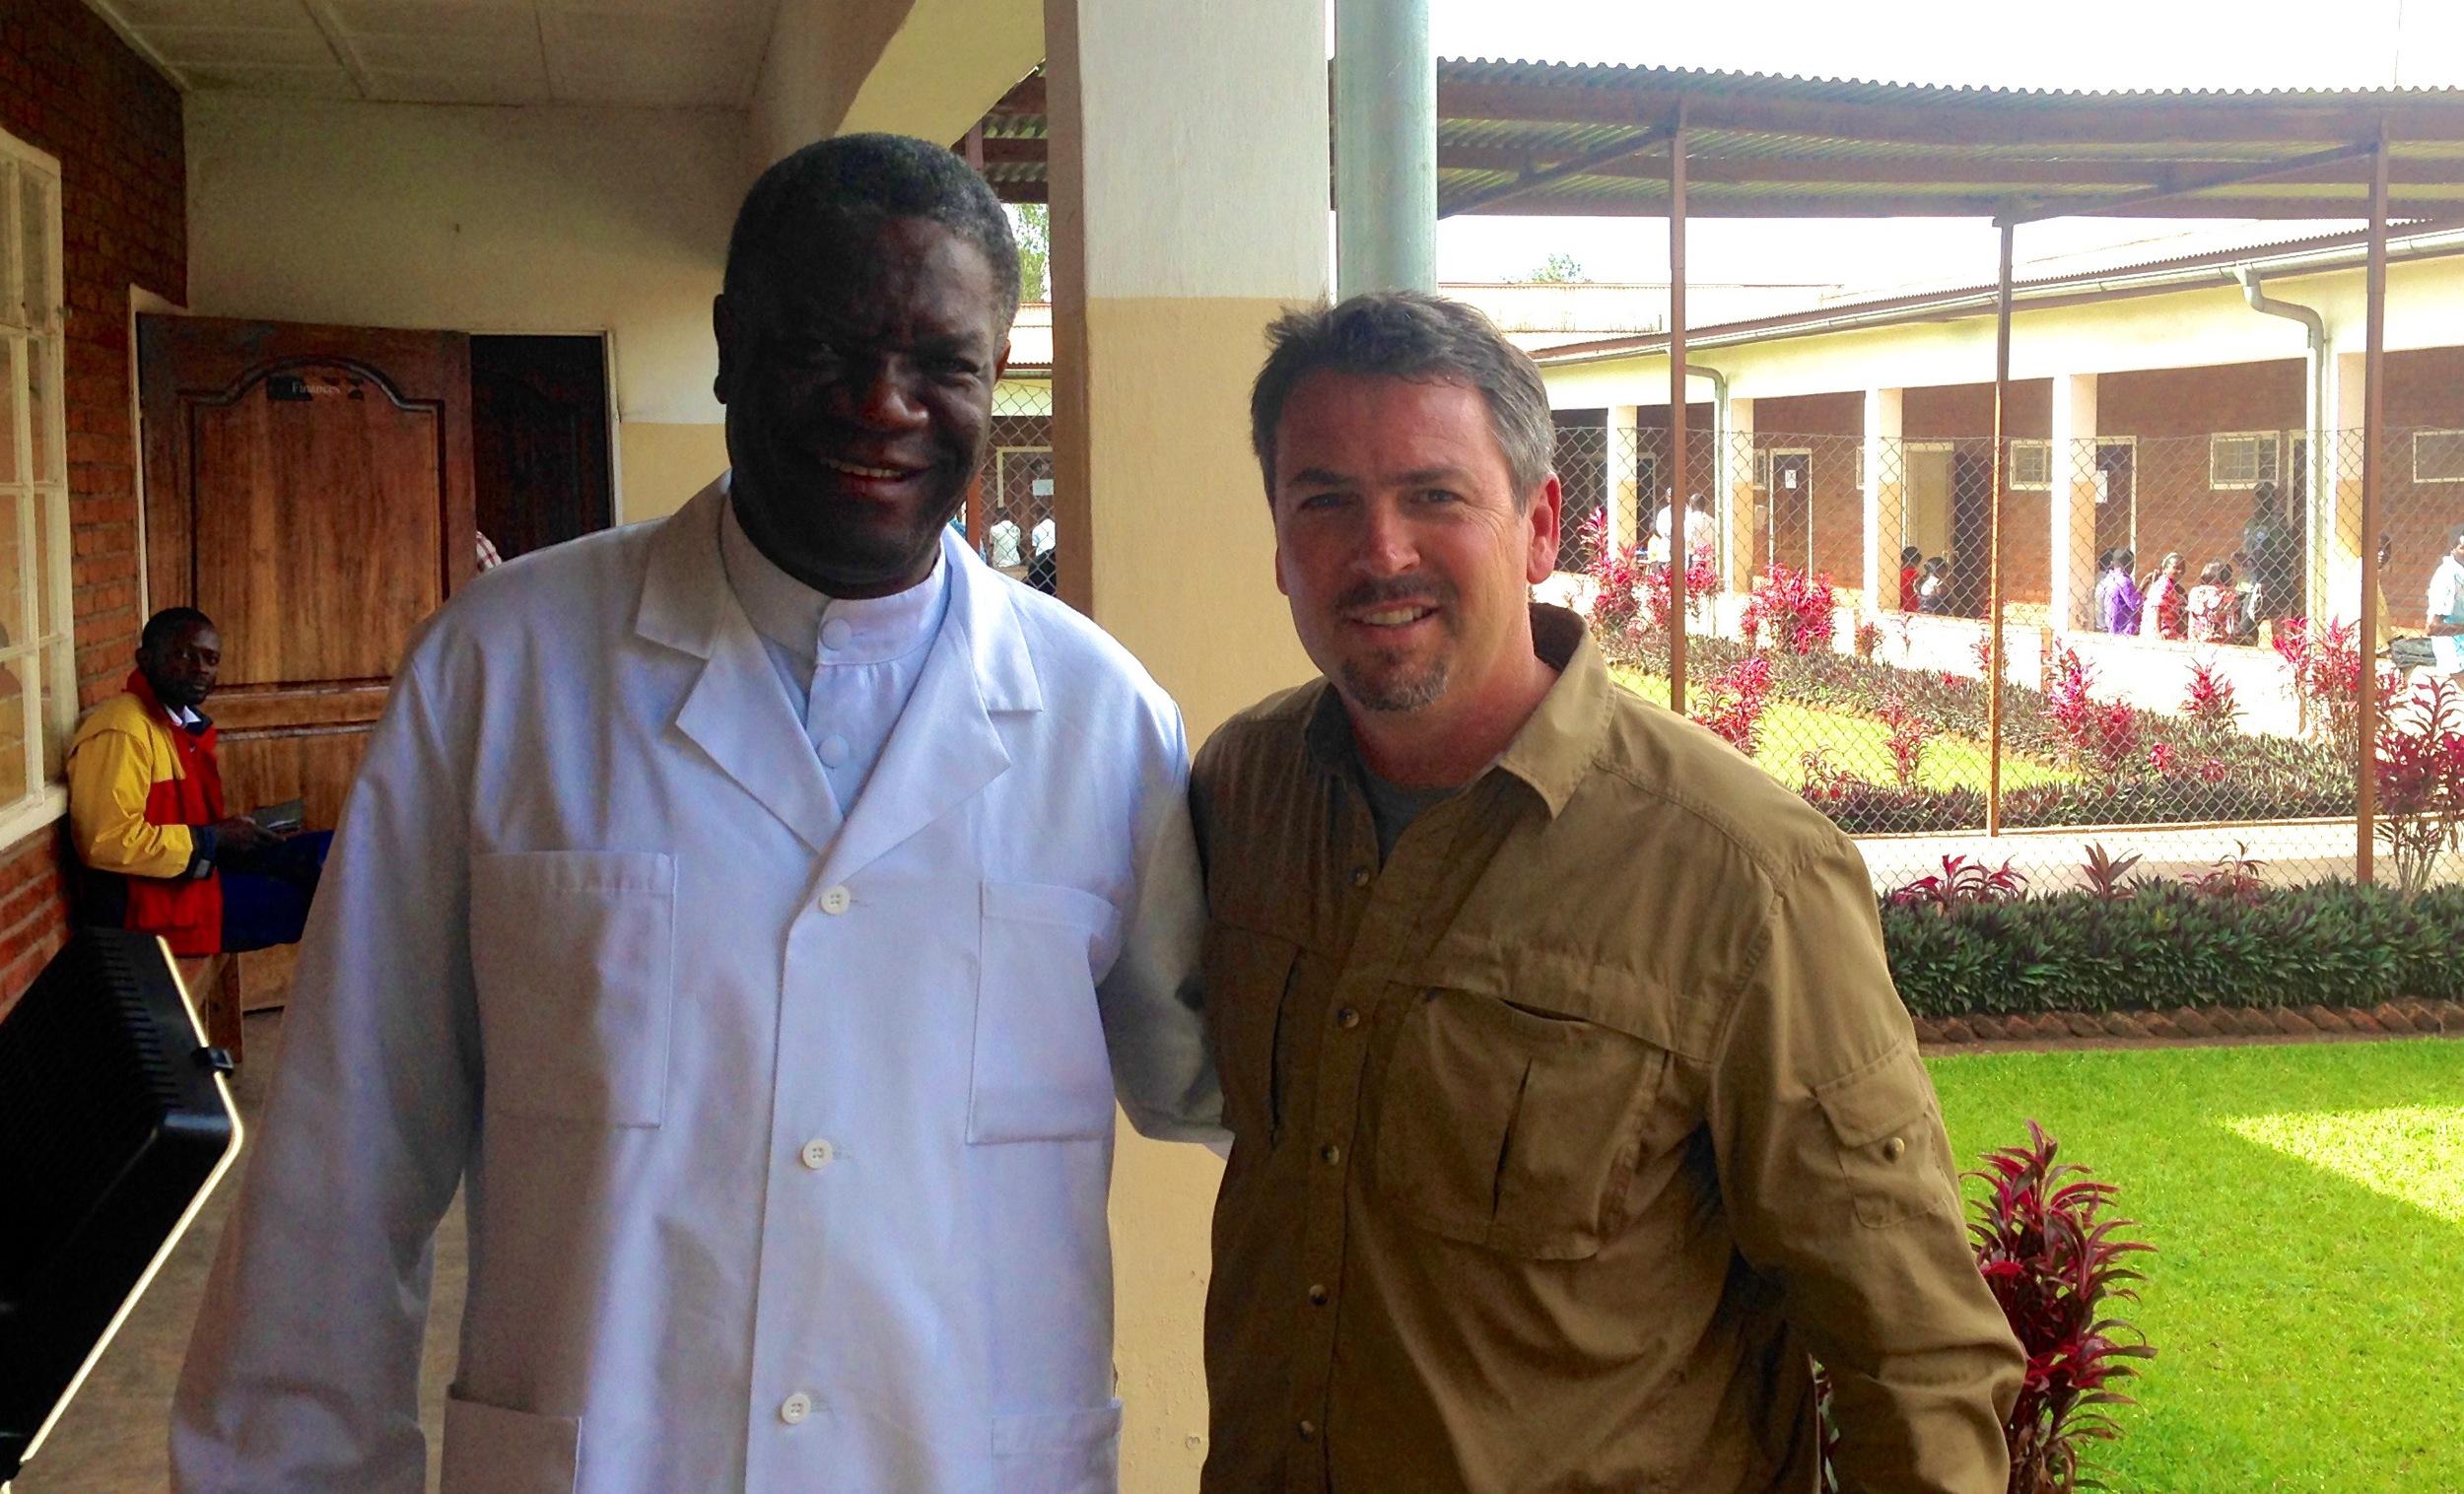 Nobel Prize Nominee, Dr. Mukwege